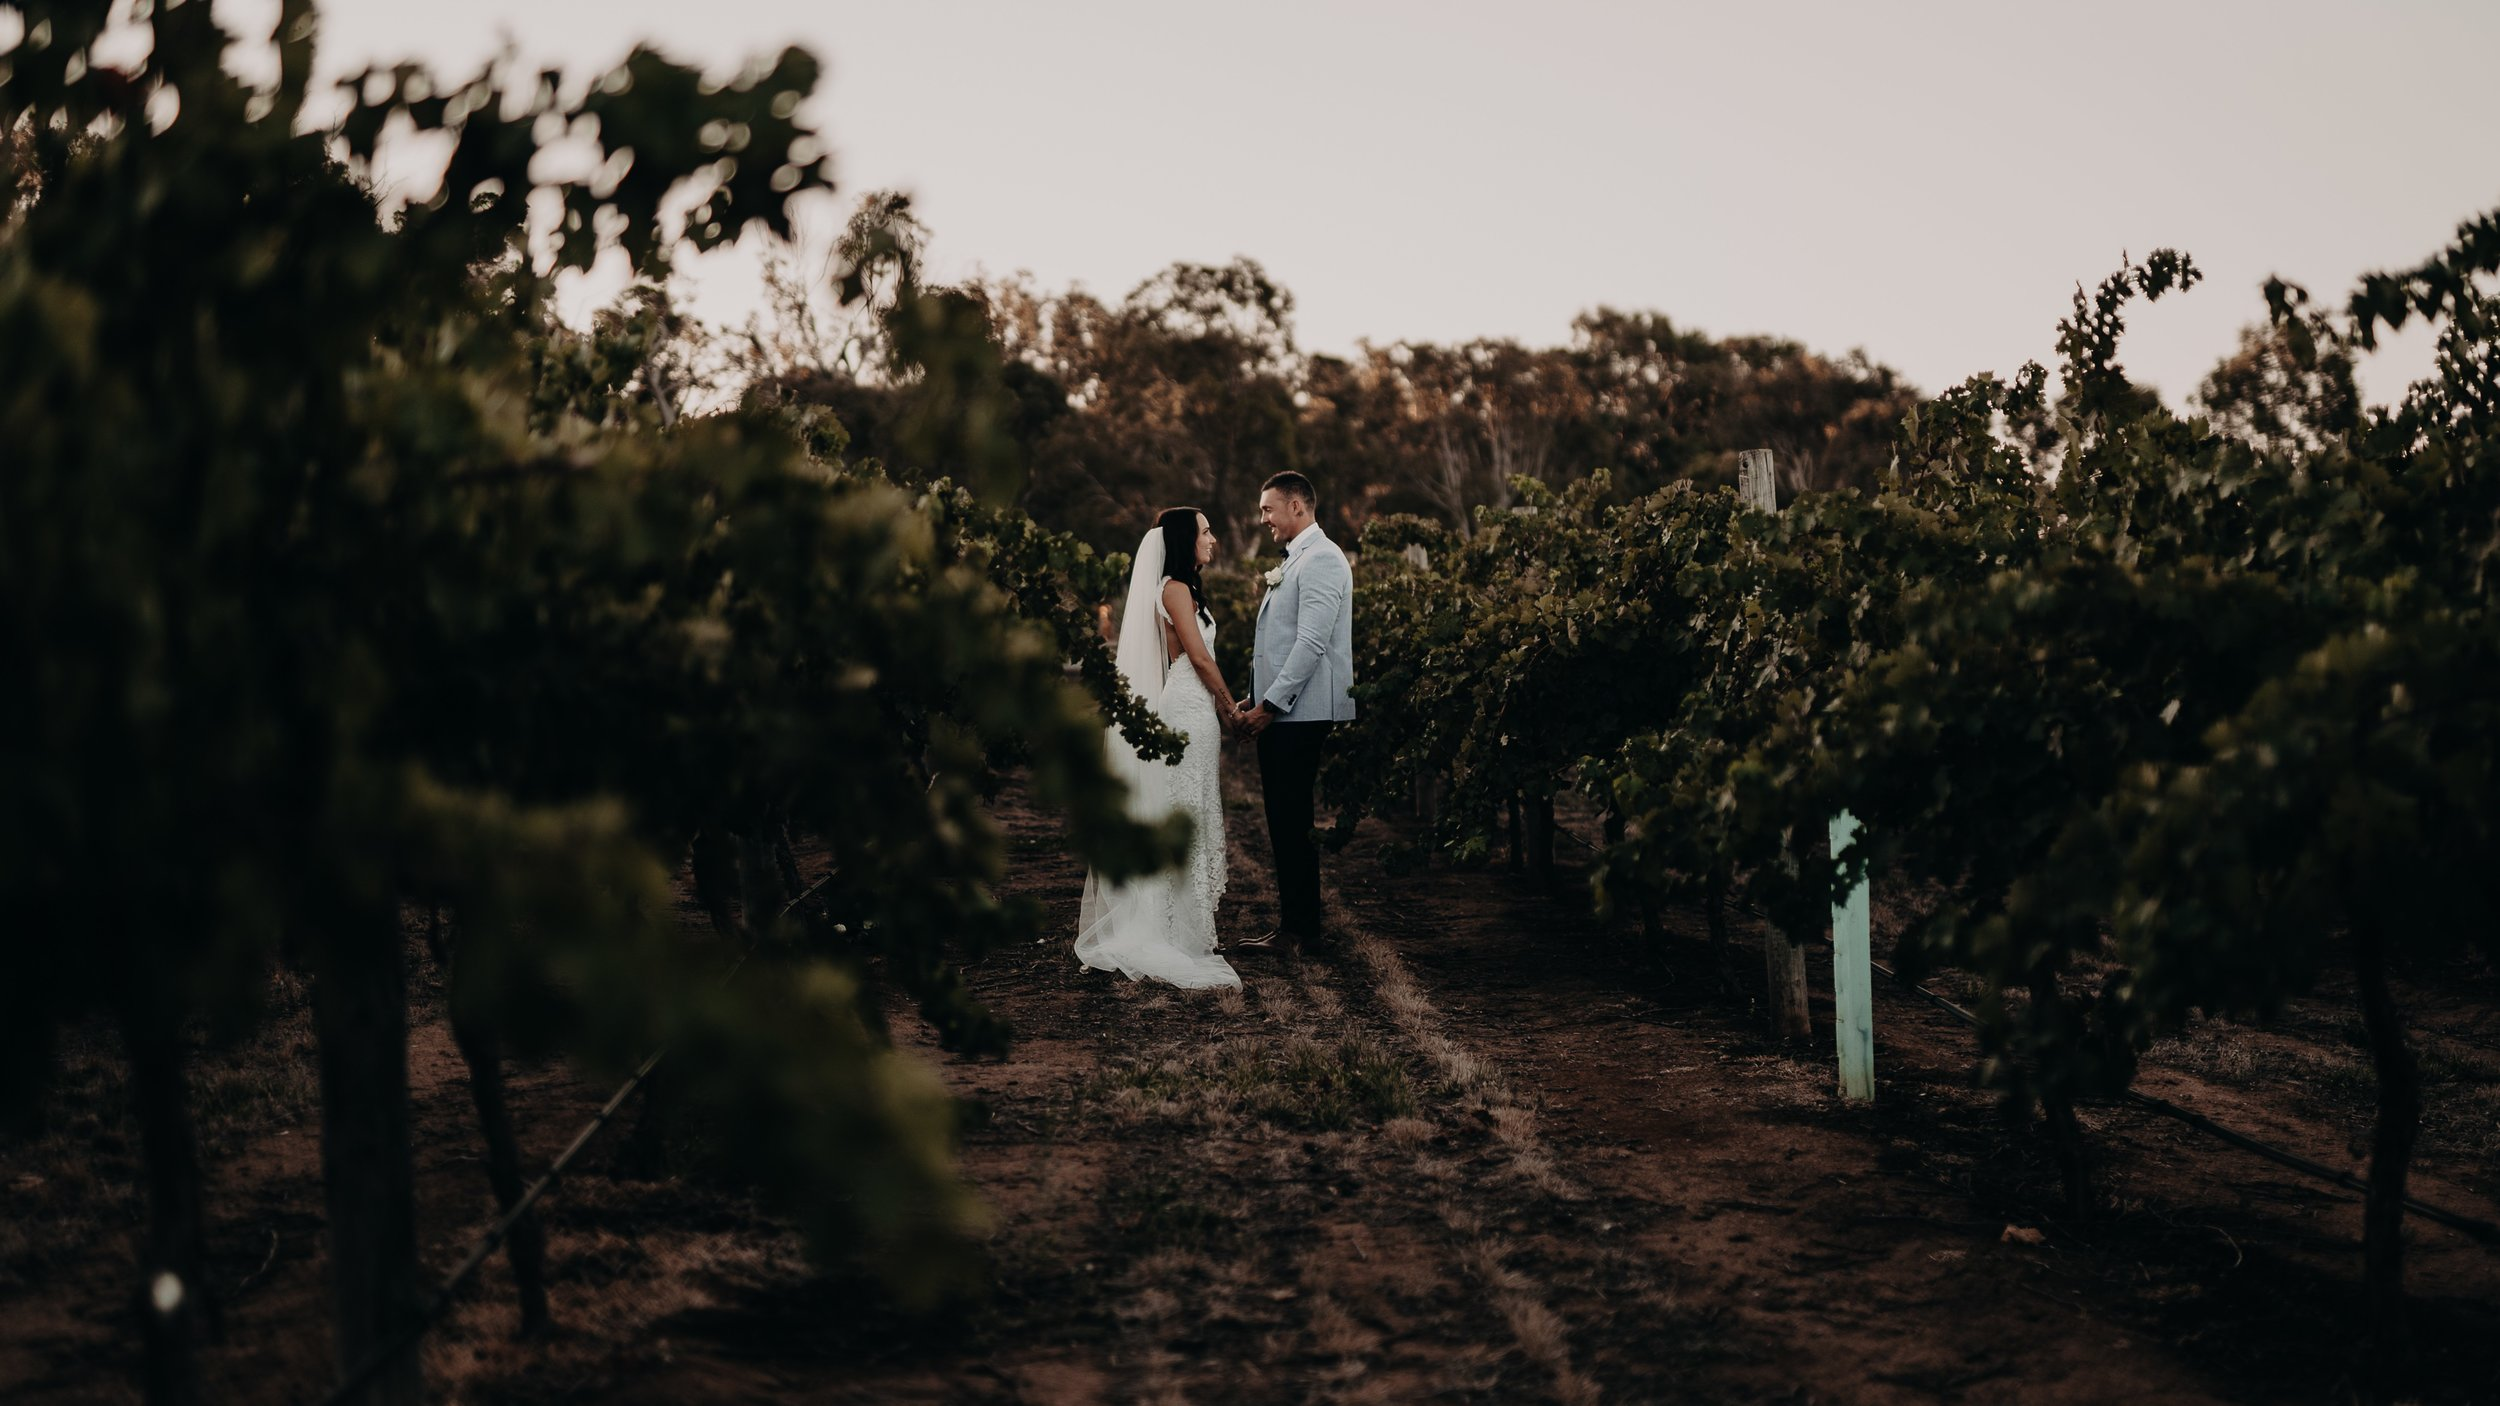 mickalathomas_puremacphotography_weddingphotographer_couplephotographer_Sheppartonphotographer_1476.jpg